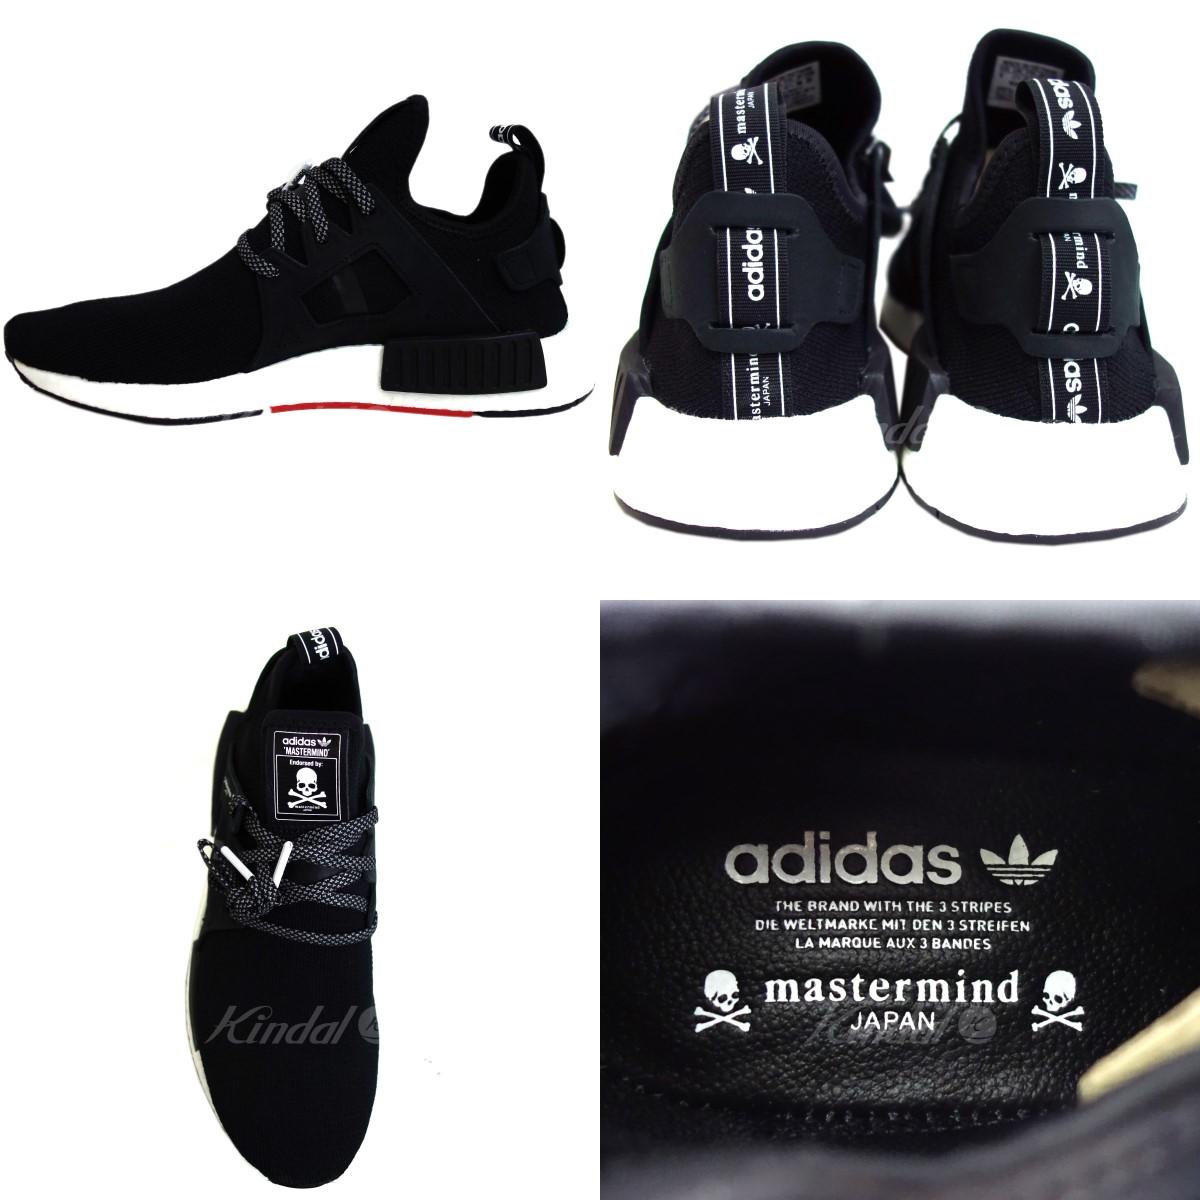 mastermind japan X adidas originals BA9728